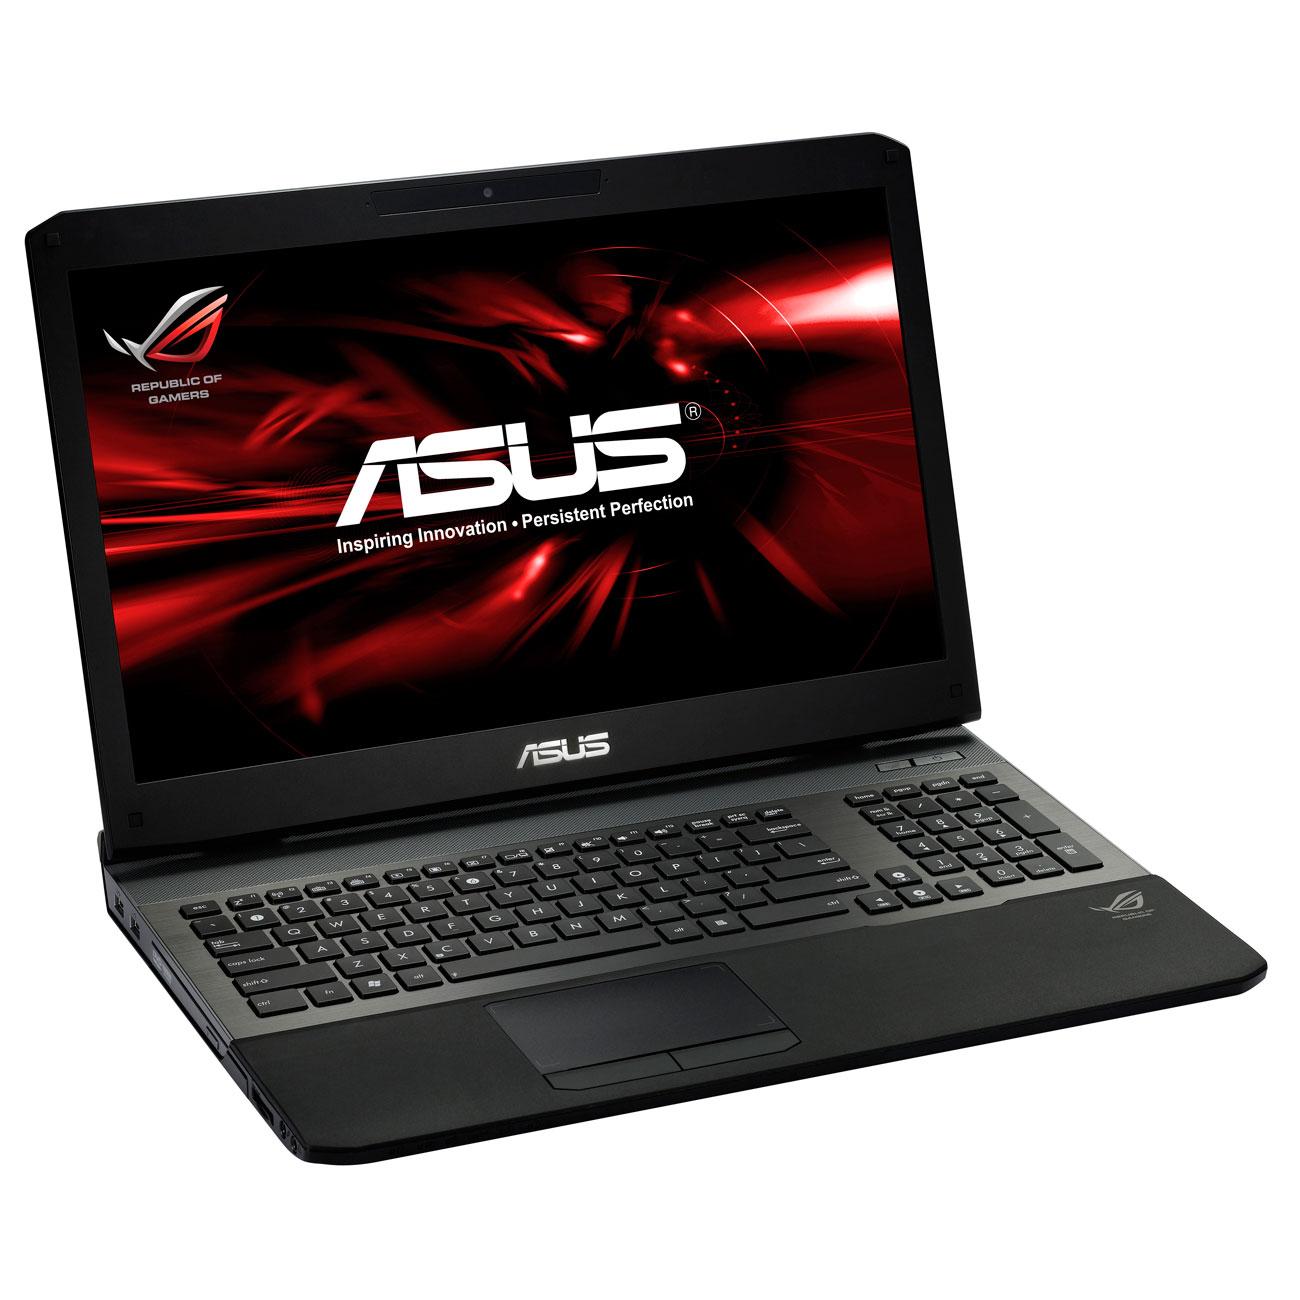 "PC portable ASUS G75VX-T4193H Intel Core i7-3630QM 8 Go SSD 256 Go + HDD 750 Go 17.3"" LED NVIDIA GeForce GTX 670MX Graveur DVD Wi-Fi N/Bluetooth Webcam Windows 8 64 bits (garantie constructeur 2 ans)"